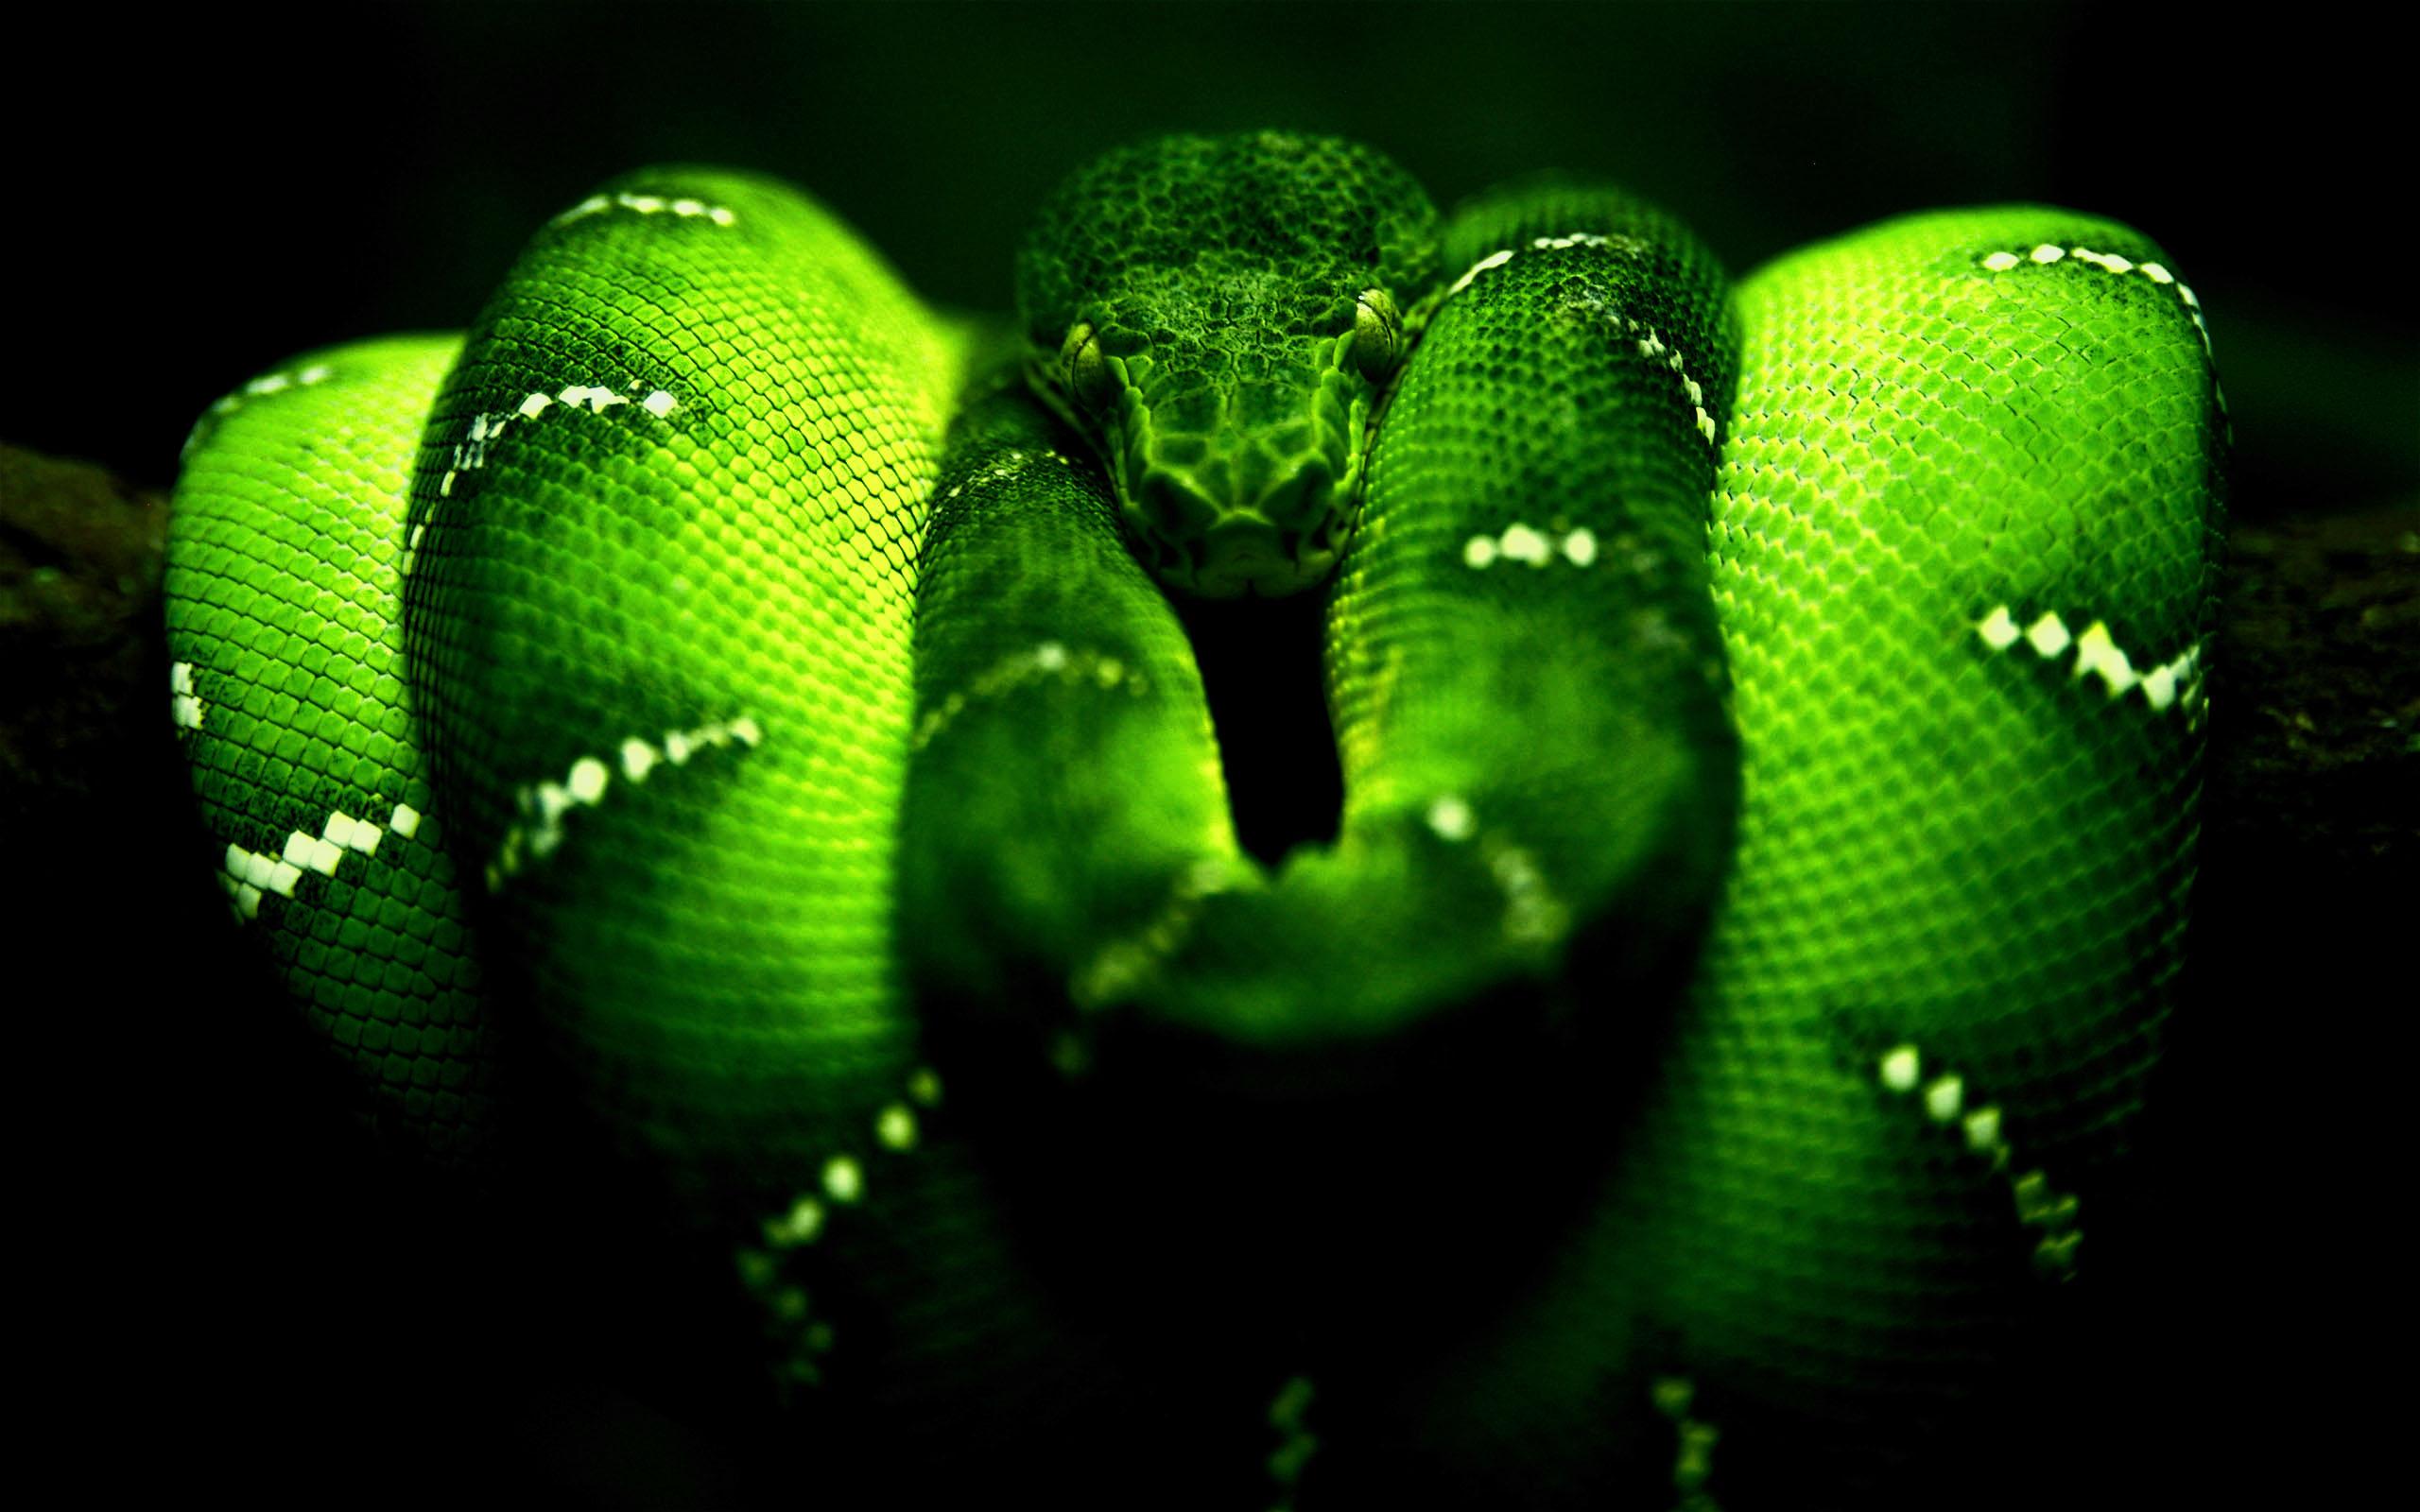 48 Neon Snake Wallpaper On Wallpapersafari